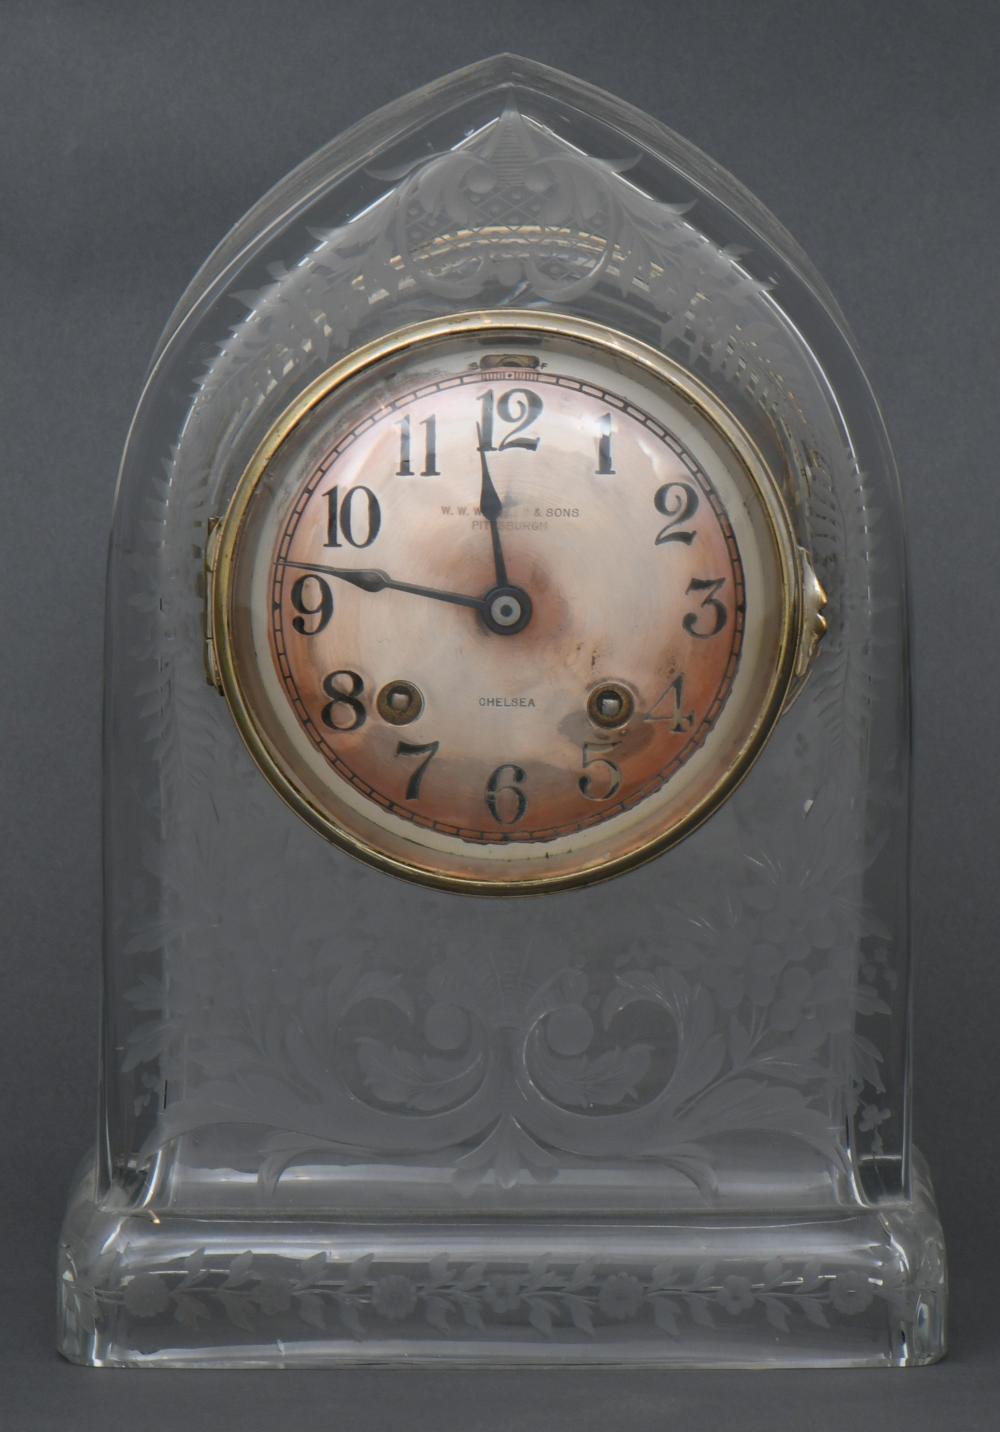 Chelsea Clock Co. Cut Glass Mantel Clock